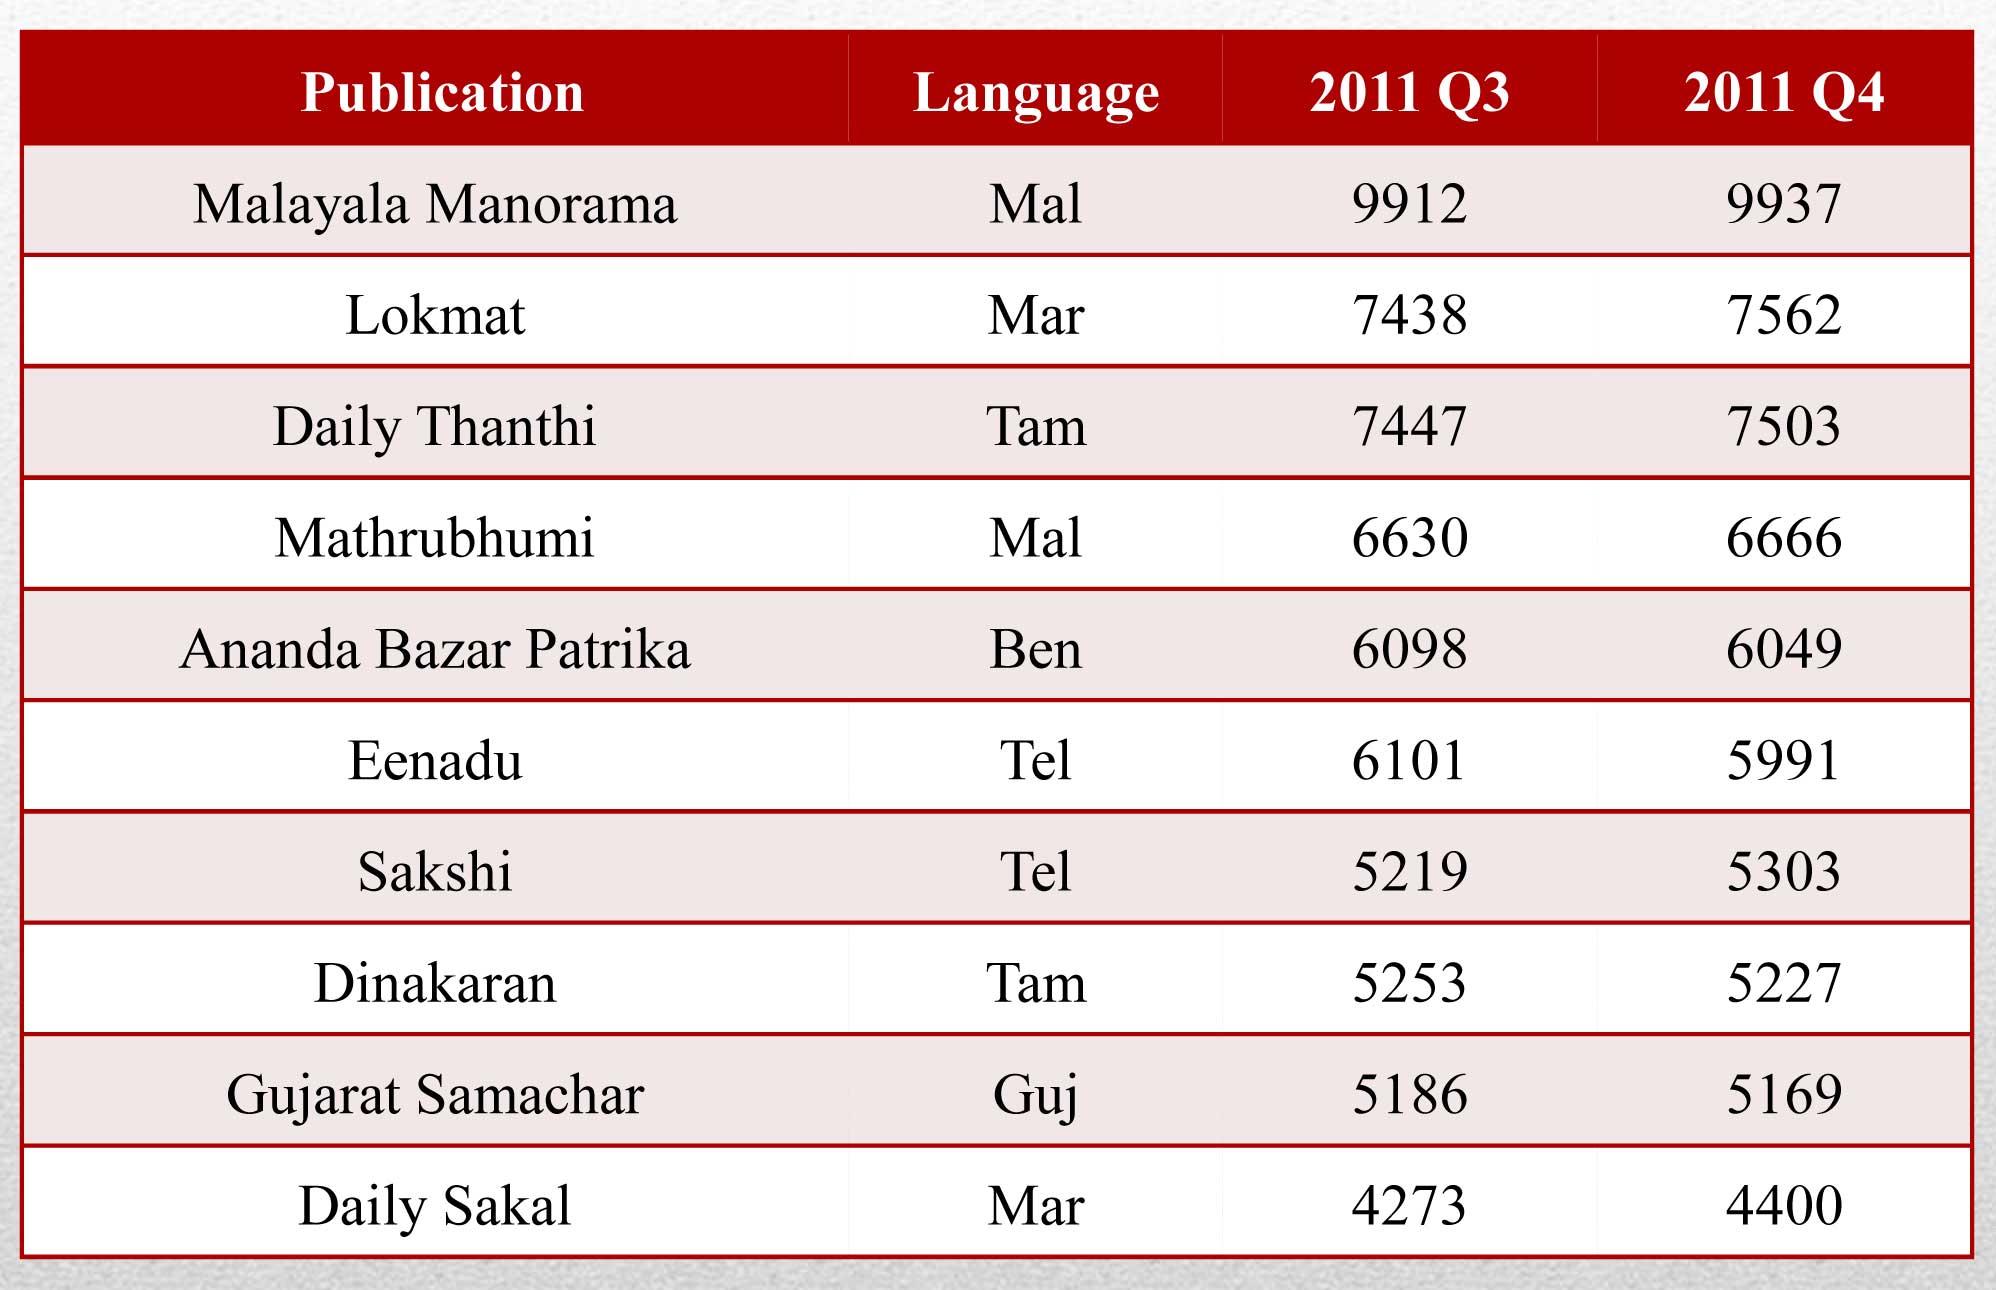 Top 10 Language Dailies